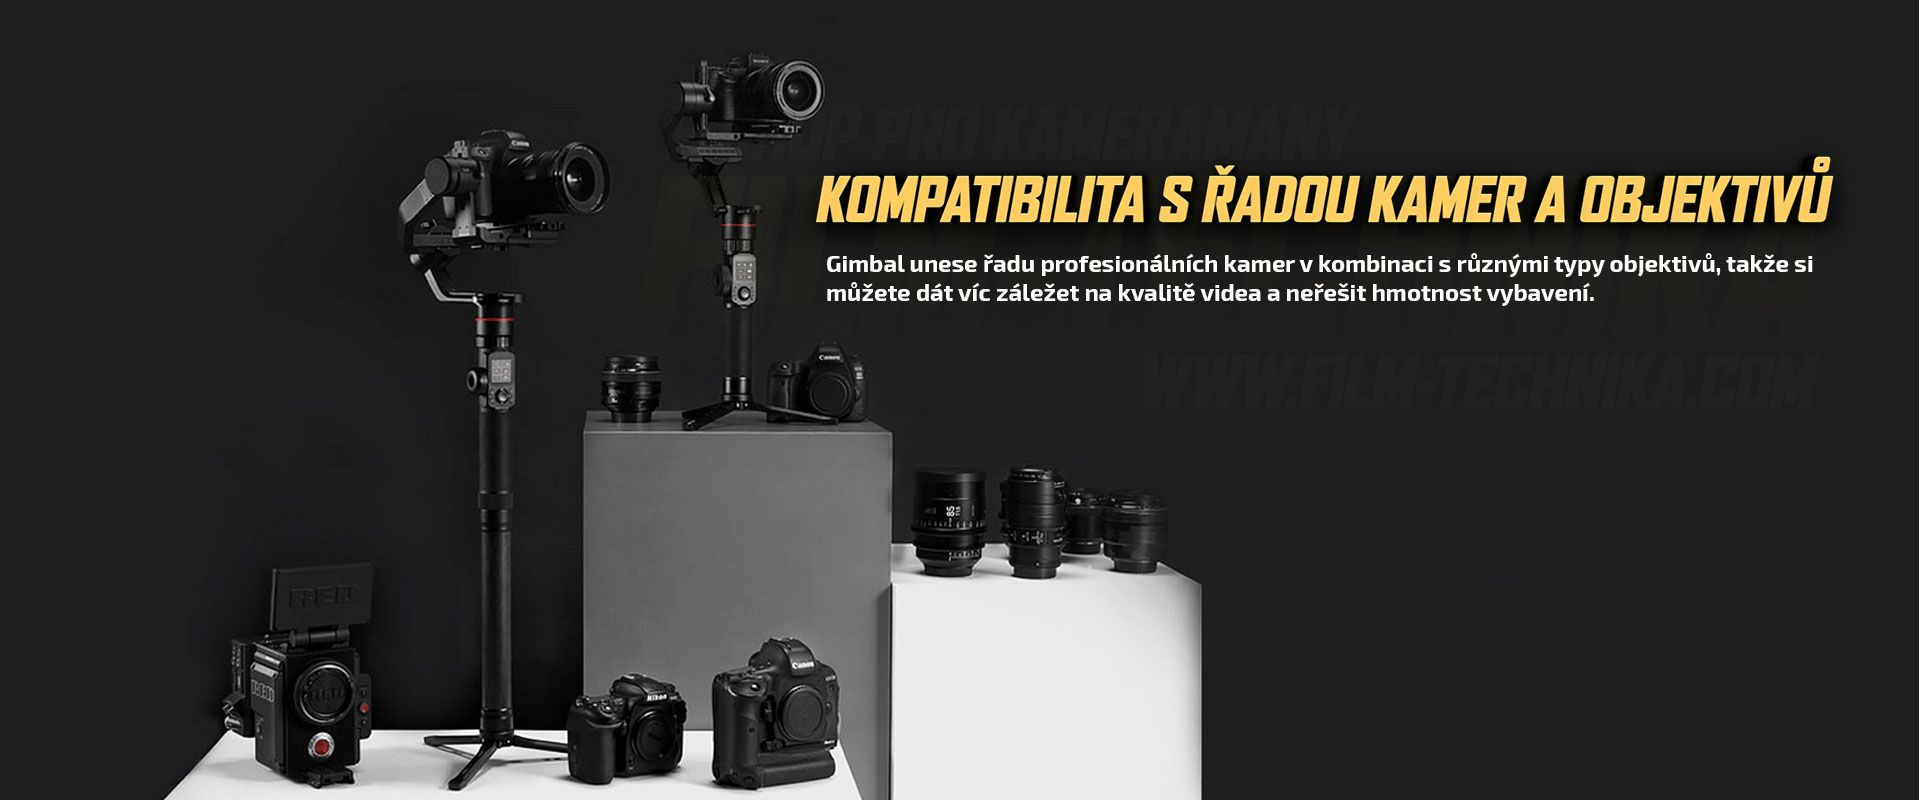 film-technika-feiyu-ak2000-11intext2